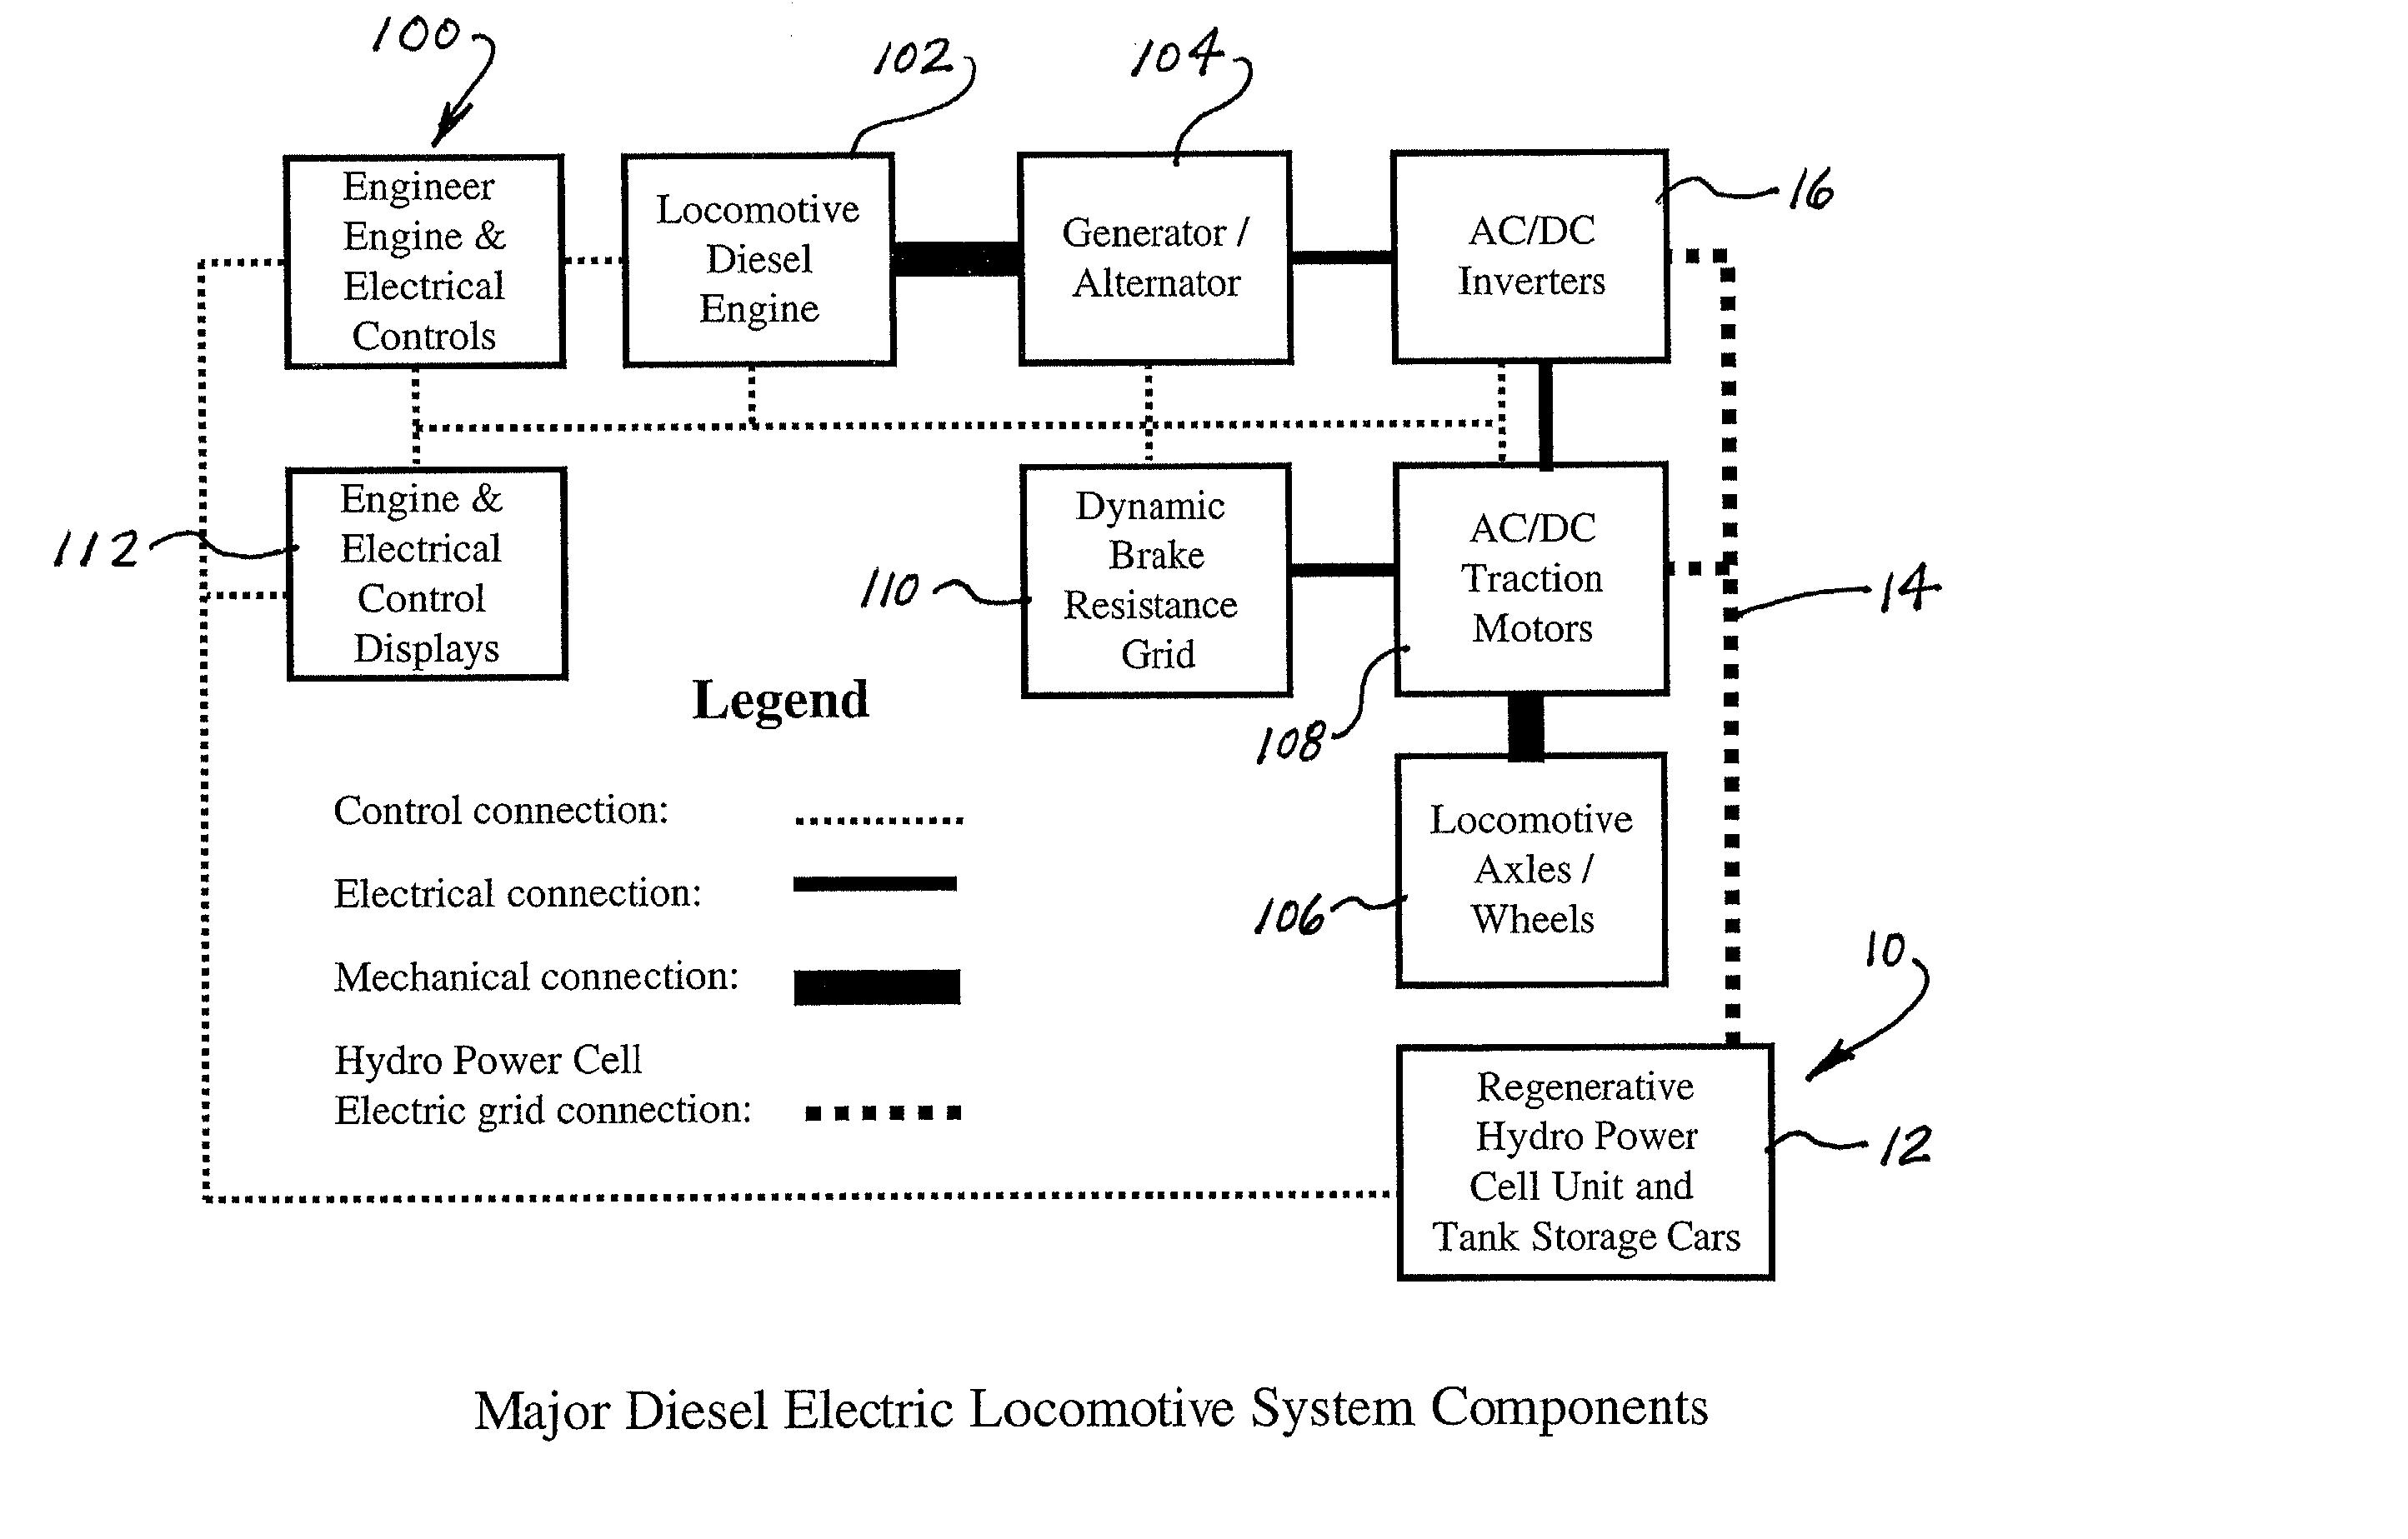 Patent Us20020117857 Diesel Electric Regenerative Hydro Power Cell Dynamic Braking Resistor Wiring Diagram Drawing